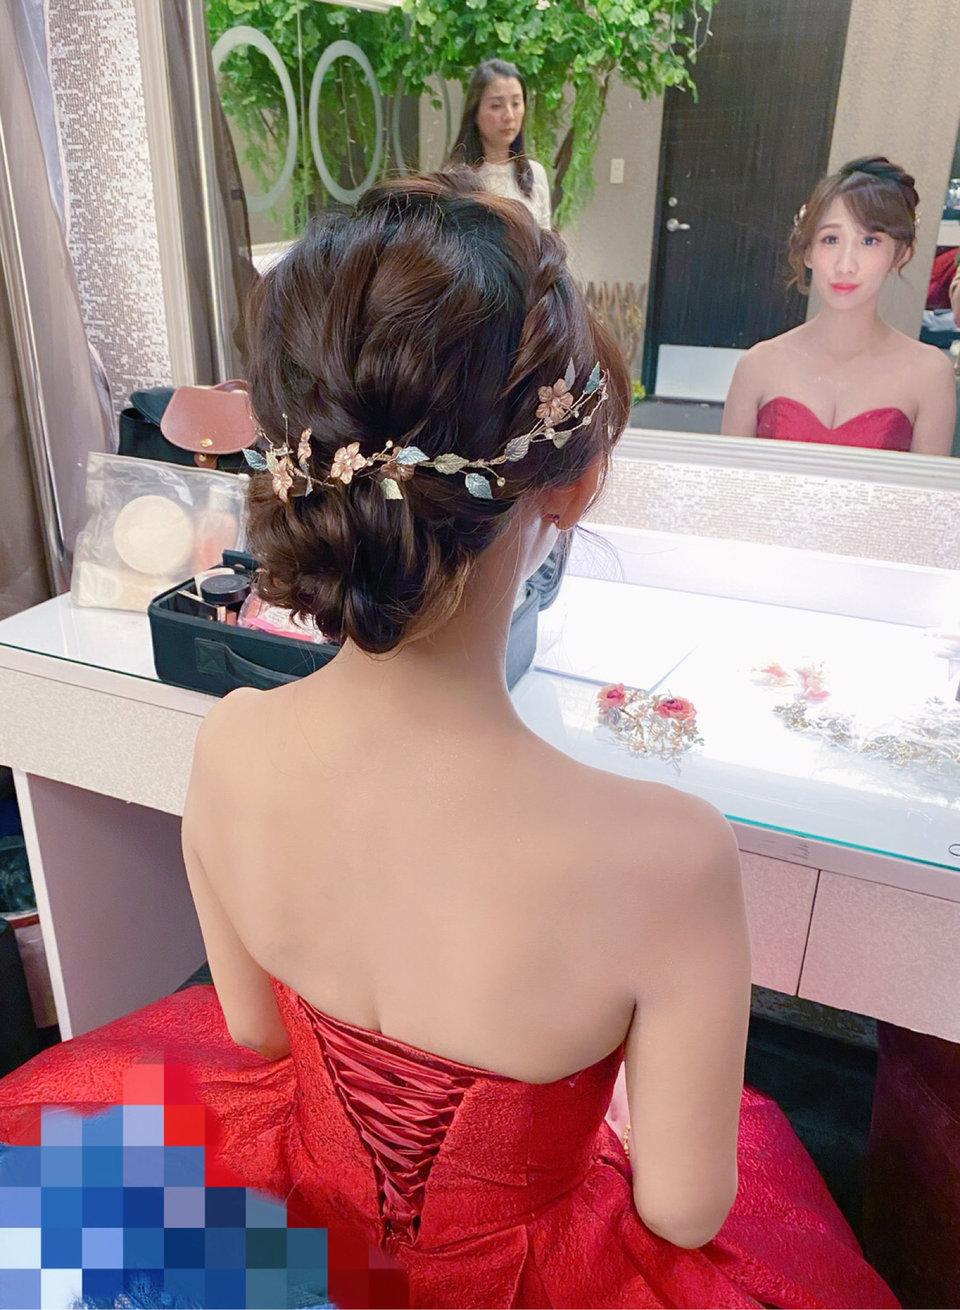 Minami  彩妝造型 噴槍底妝,謝謝您,讓我在人生最重要的日子美美的❤️